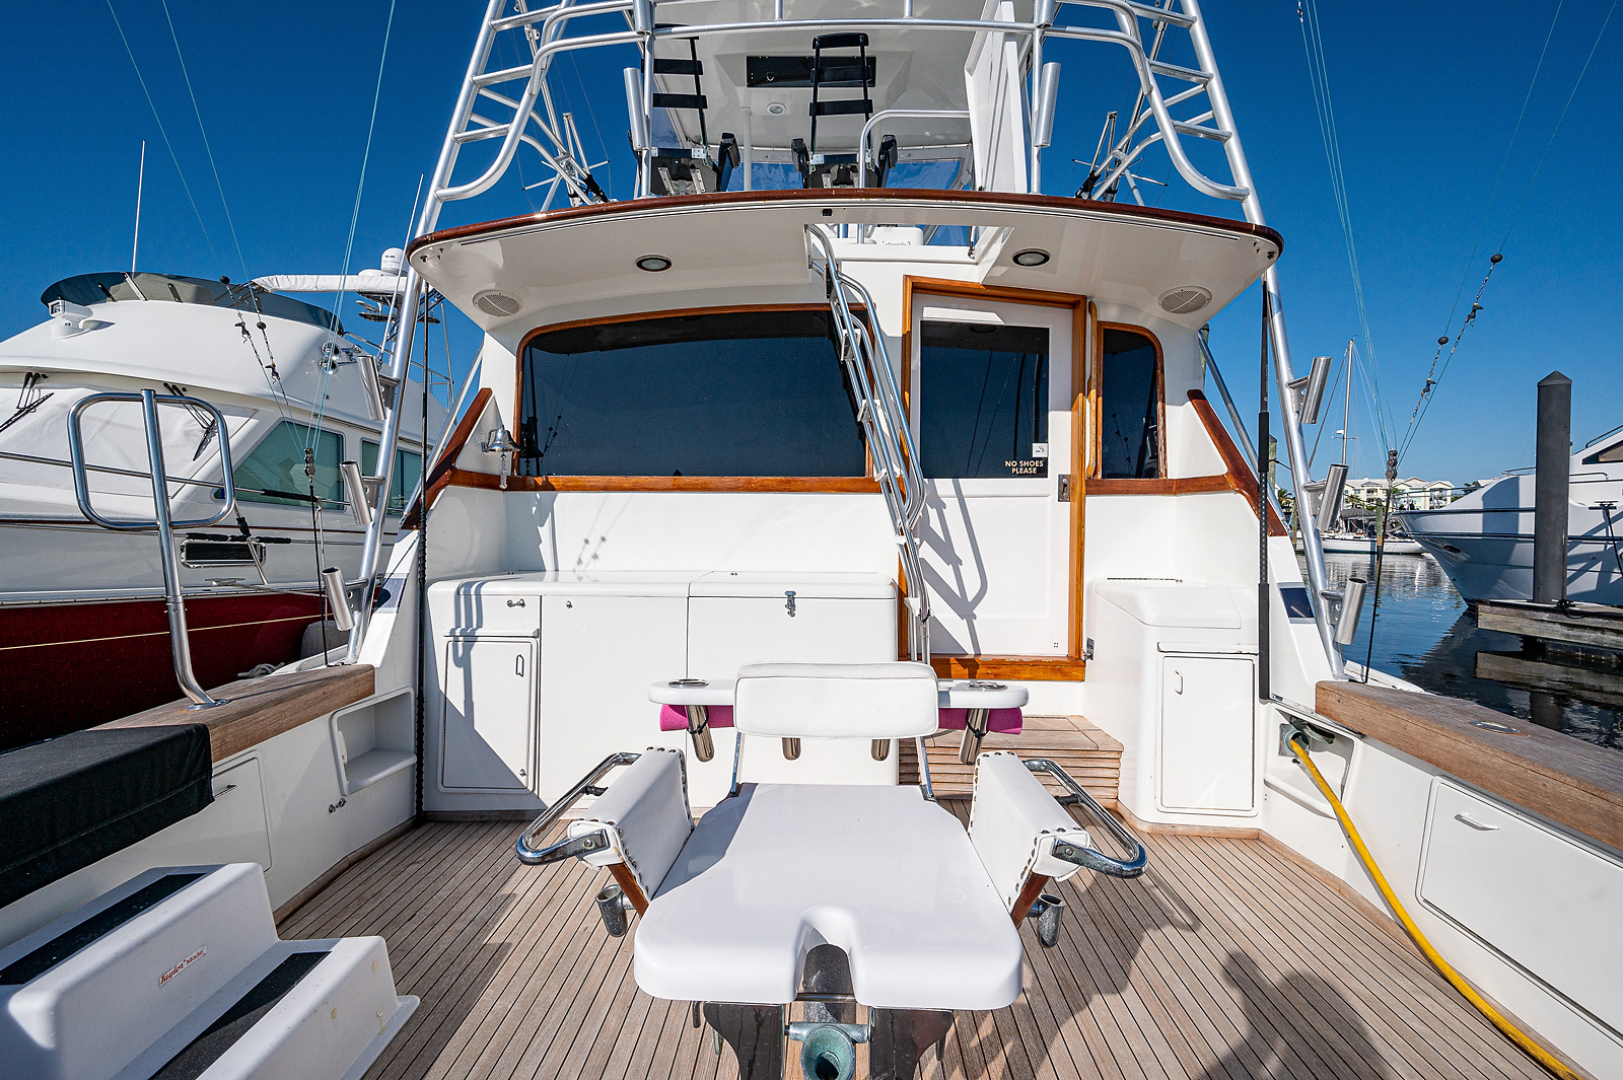 Ocean Yachts-Super Sport 1990-Blue Ridge Runner Stuart-Florida-United States-Cockpit-1598184 | Thumbnail